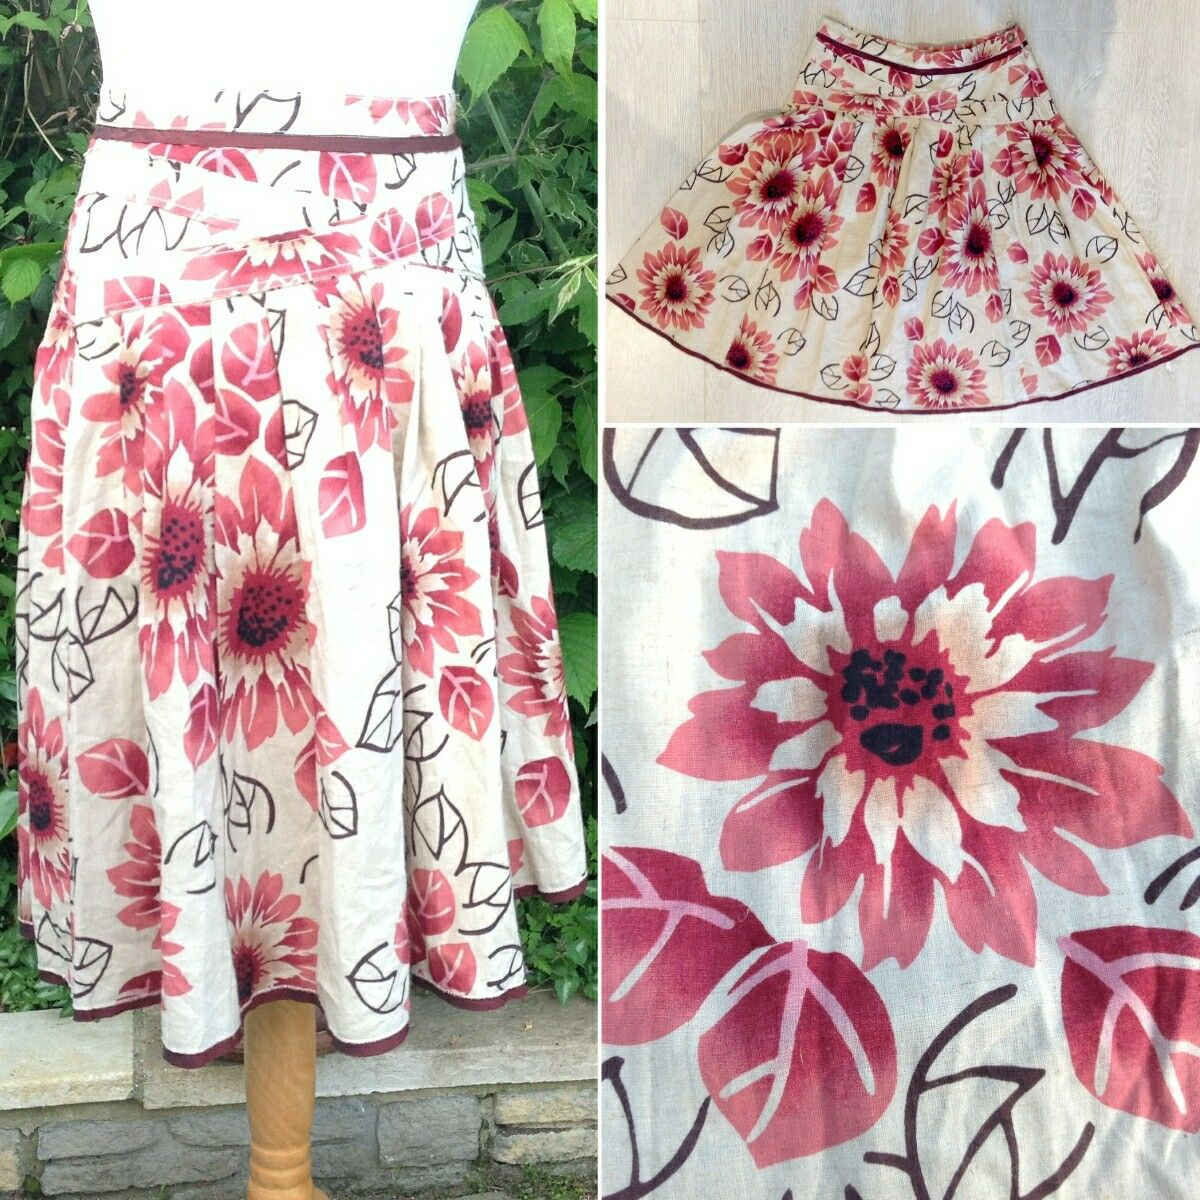 NEW ibluees by Max Mara Linen Cotton Floral Full Skirt UK14 Folk Lagenlook Cruise